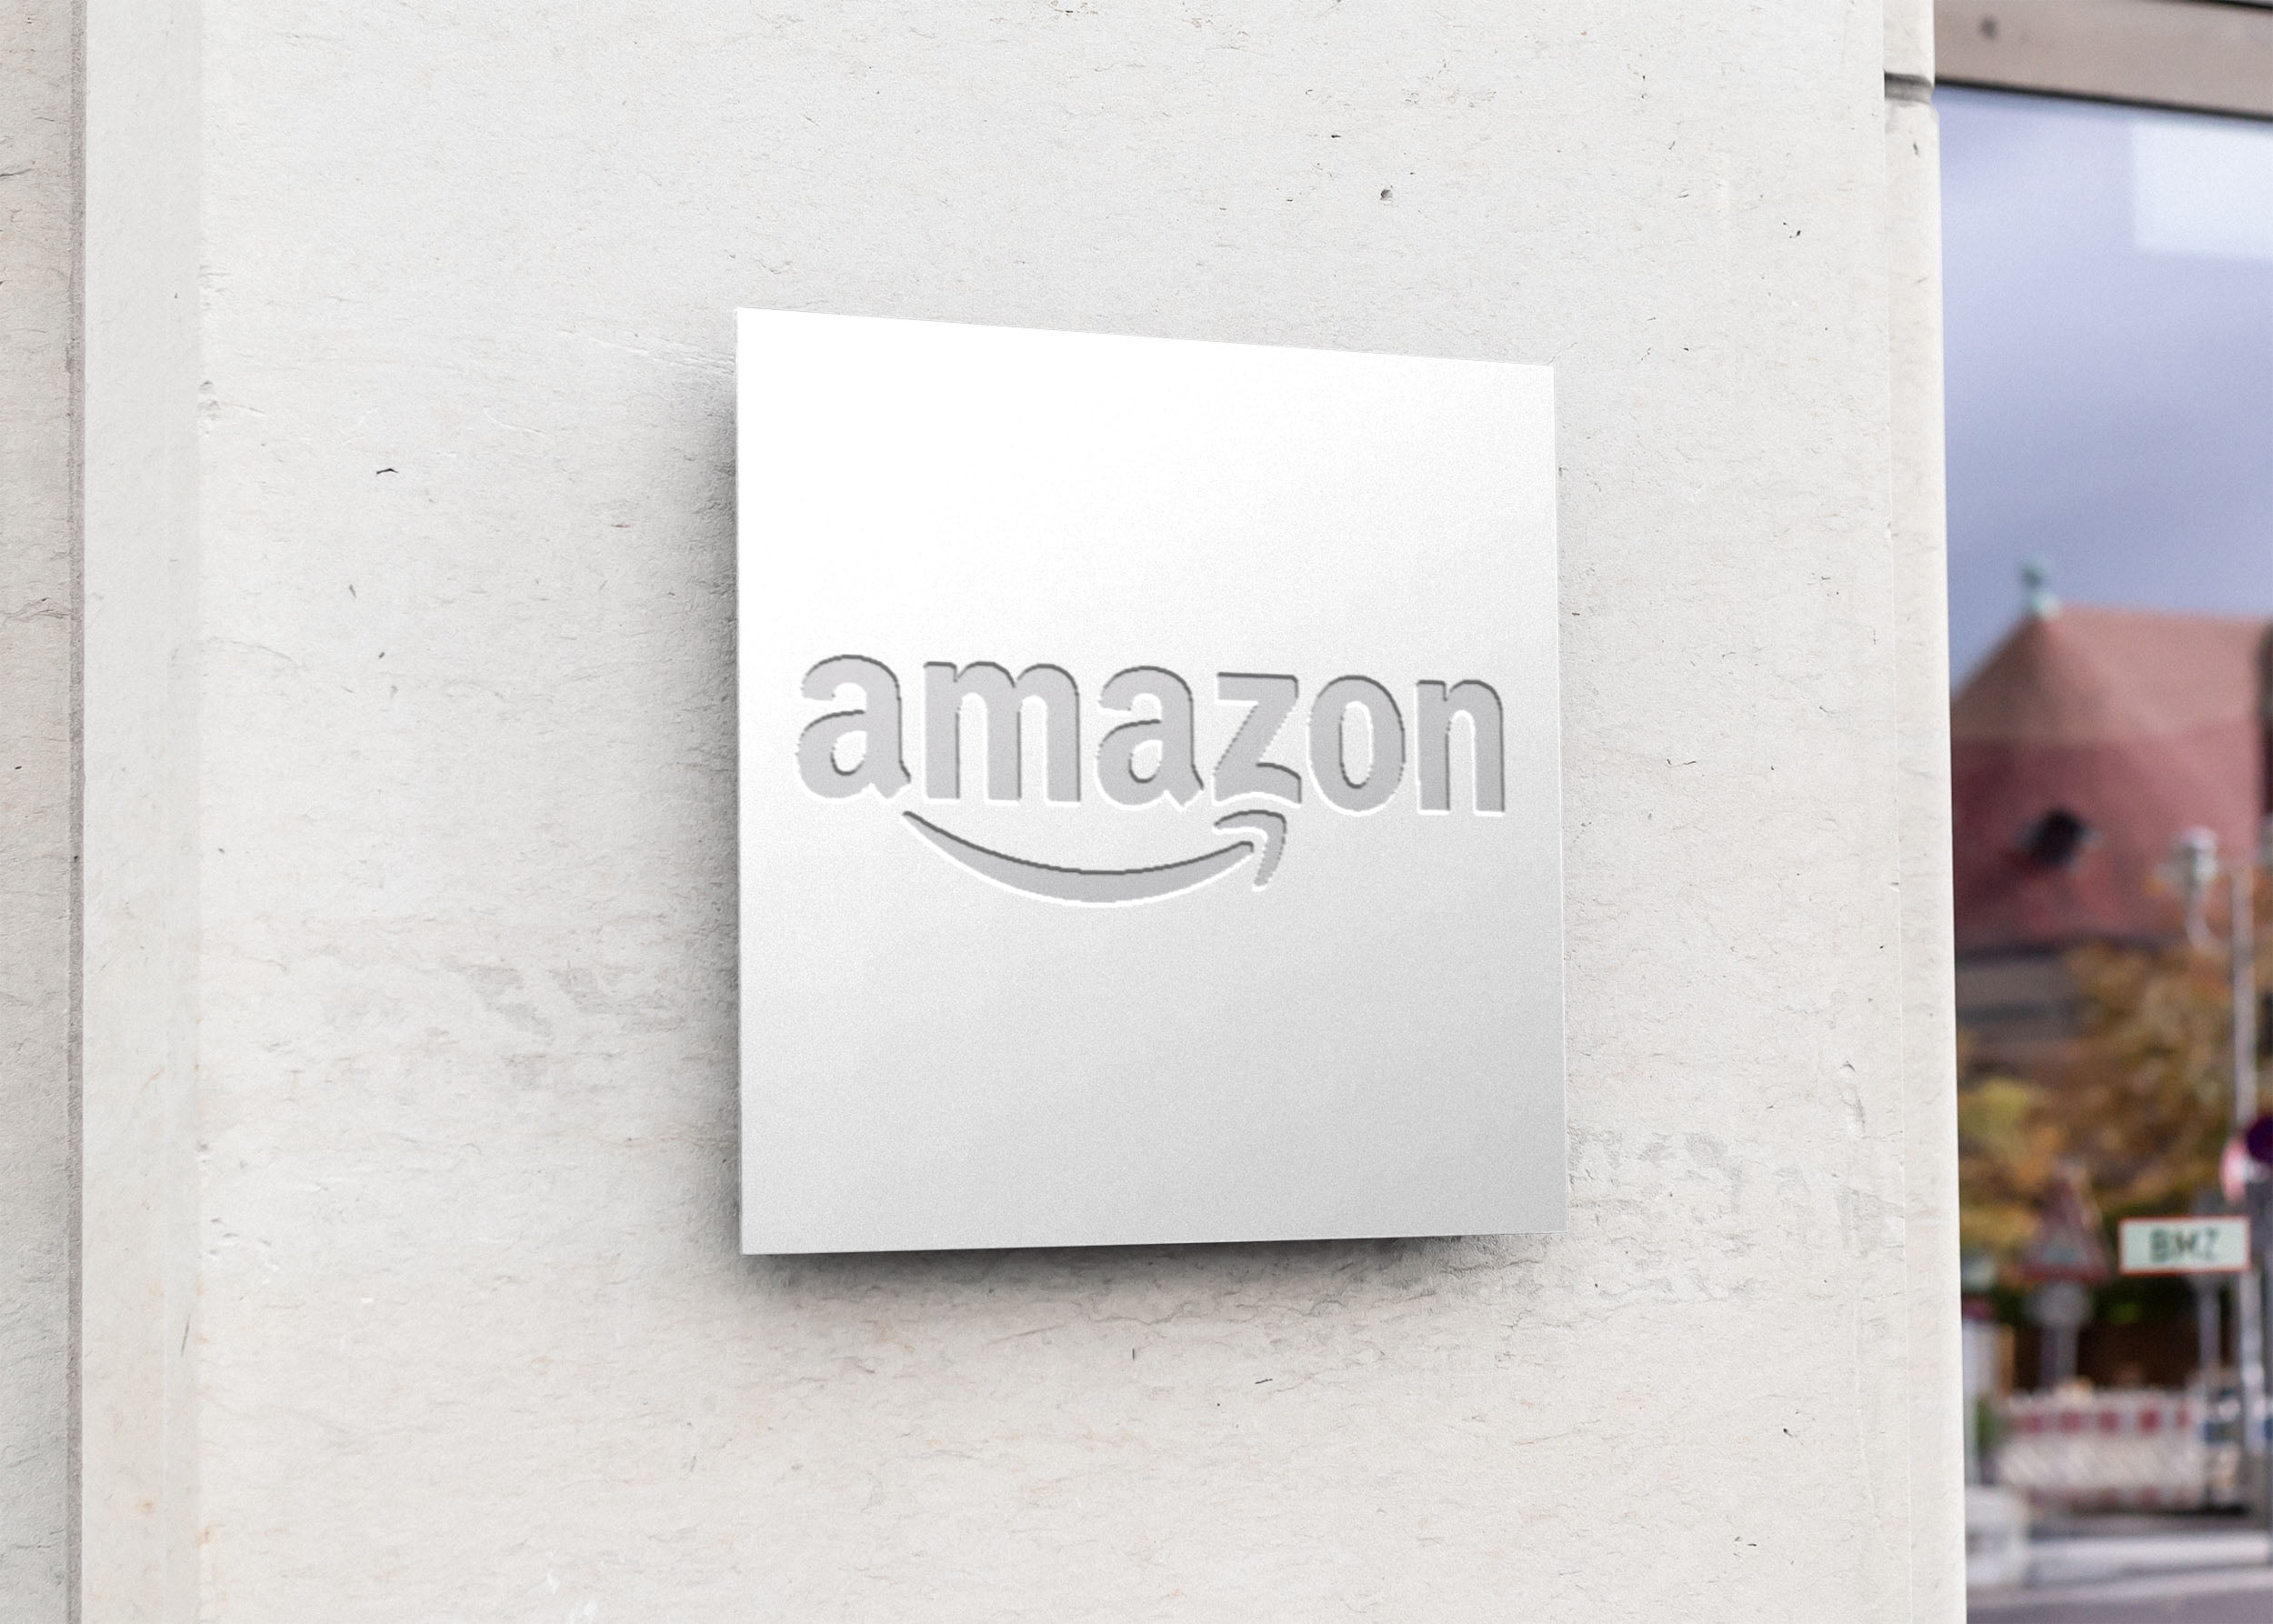 Amazon on Free Square Sign Board Mockup